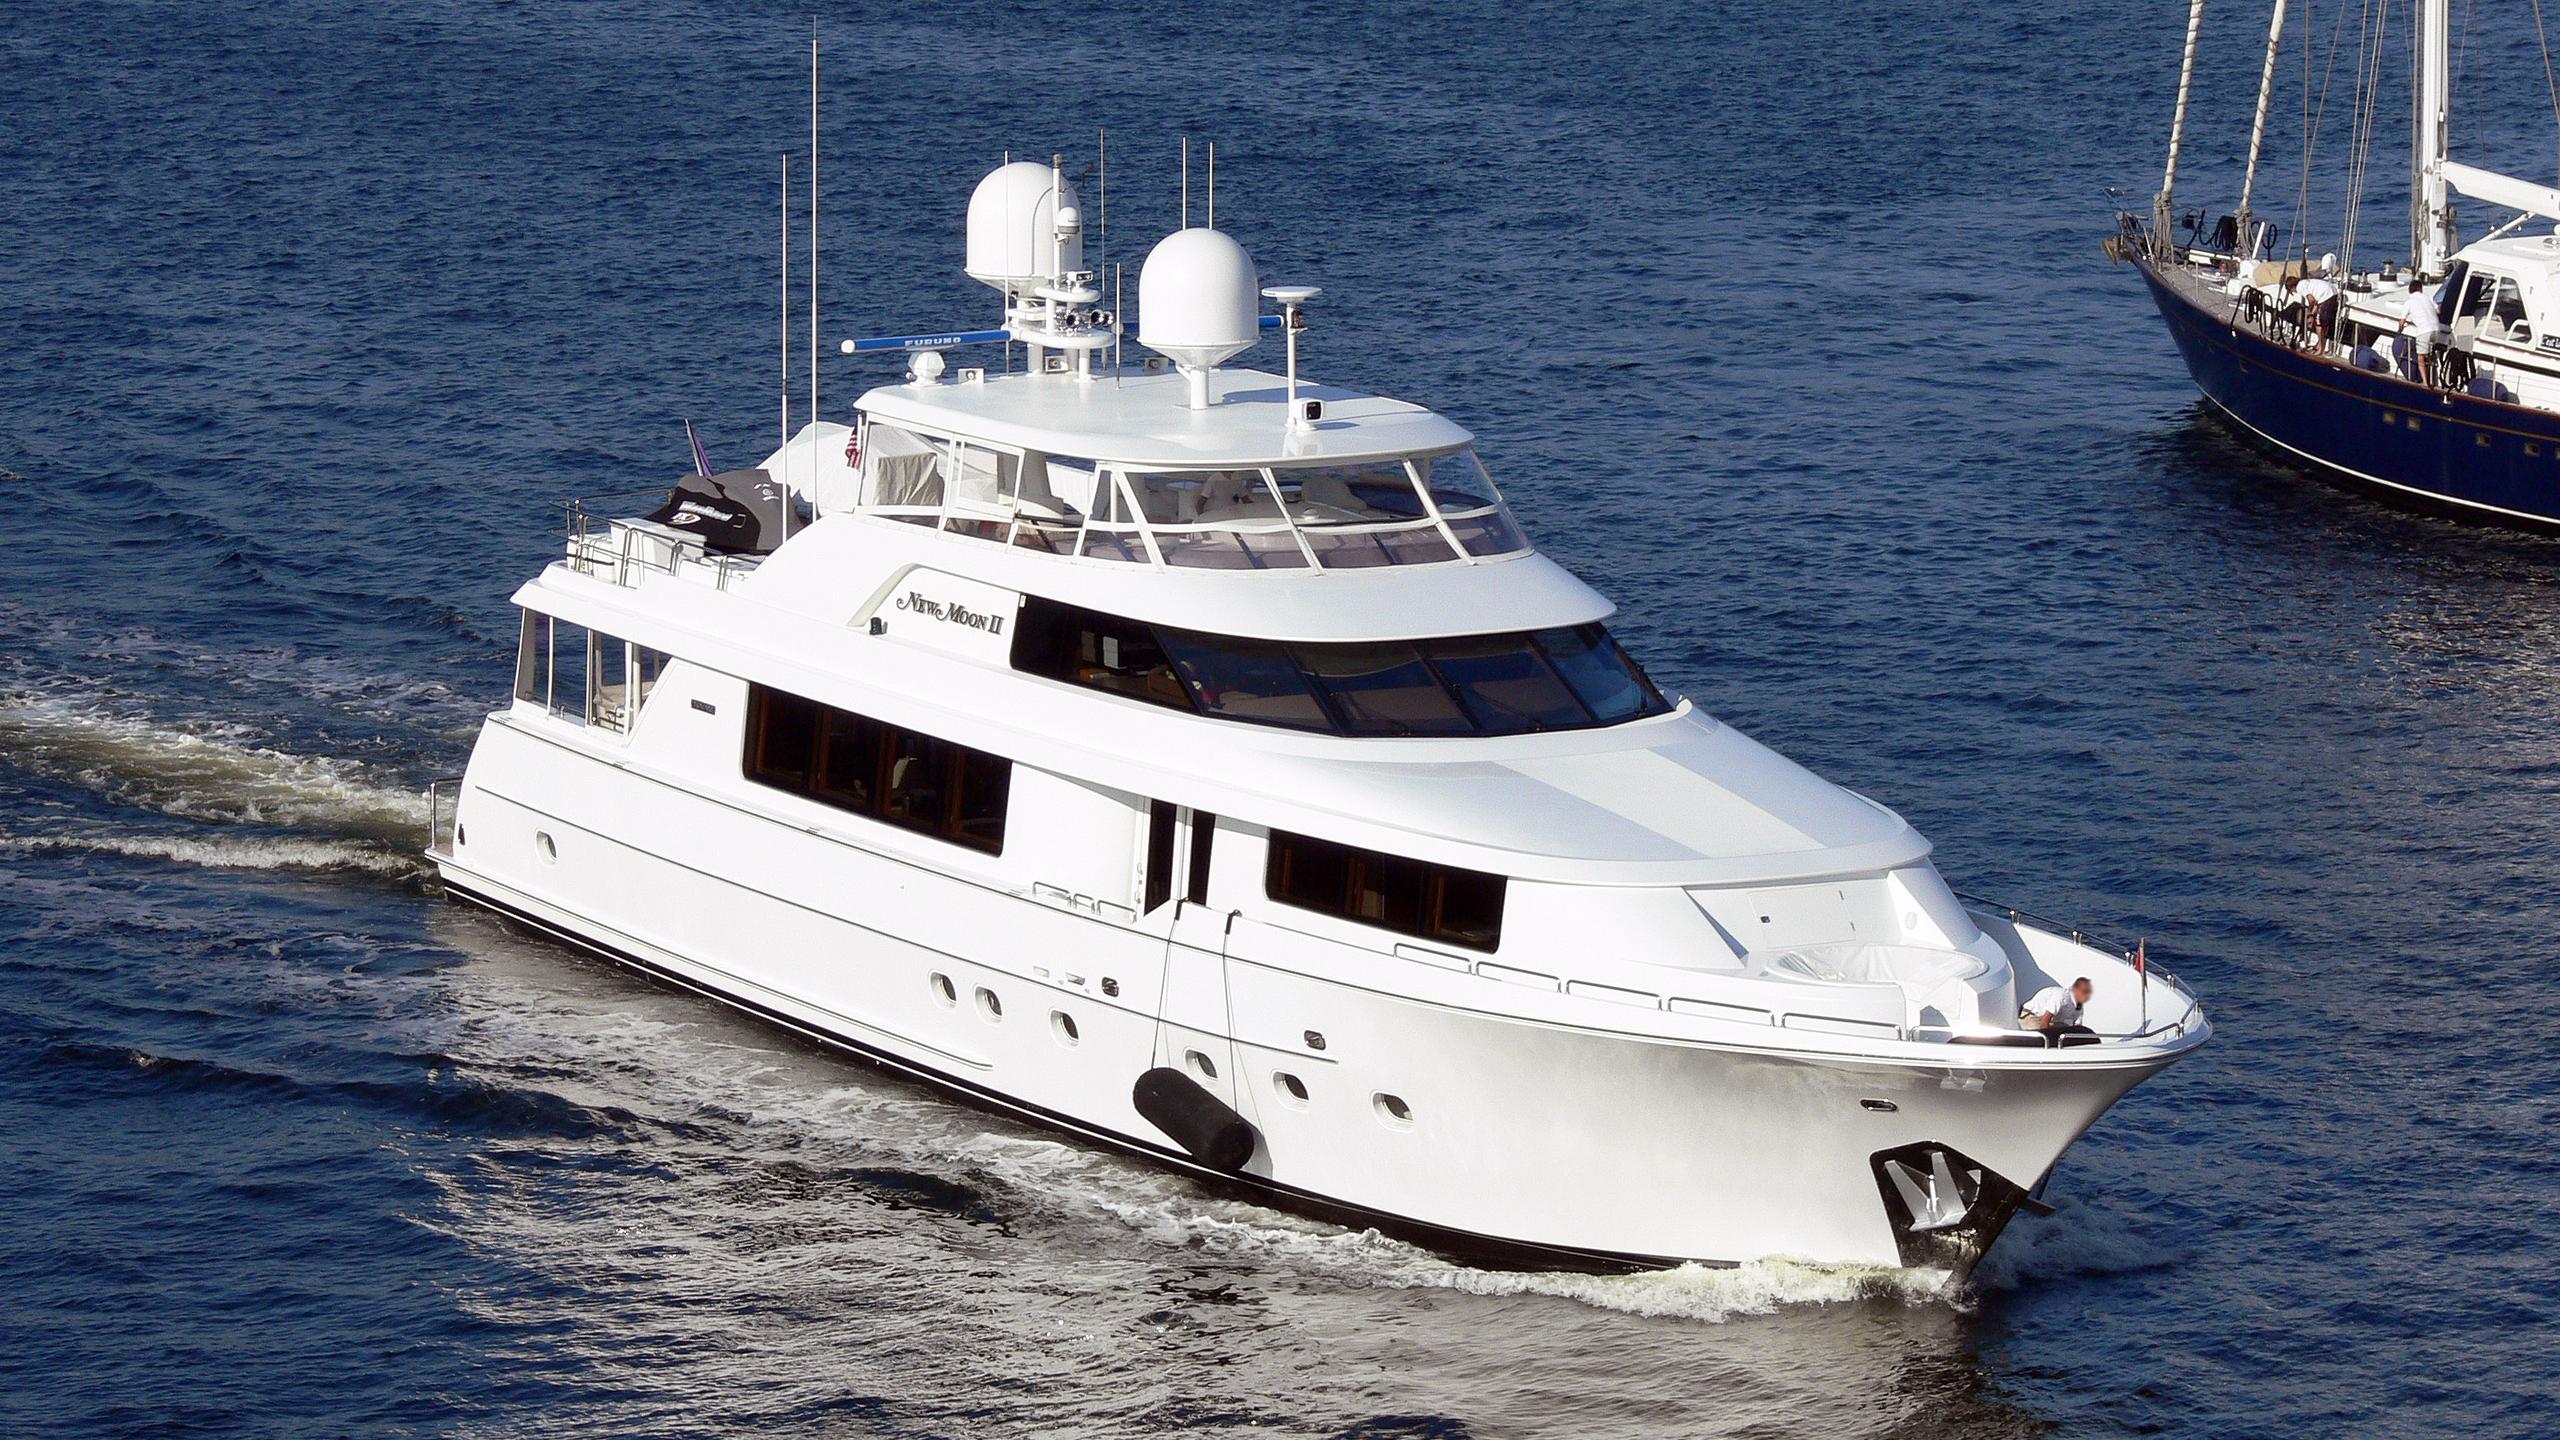 true-joy-motor-yacht-westport-2003-34m-bow-half-profile